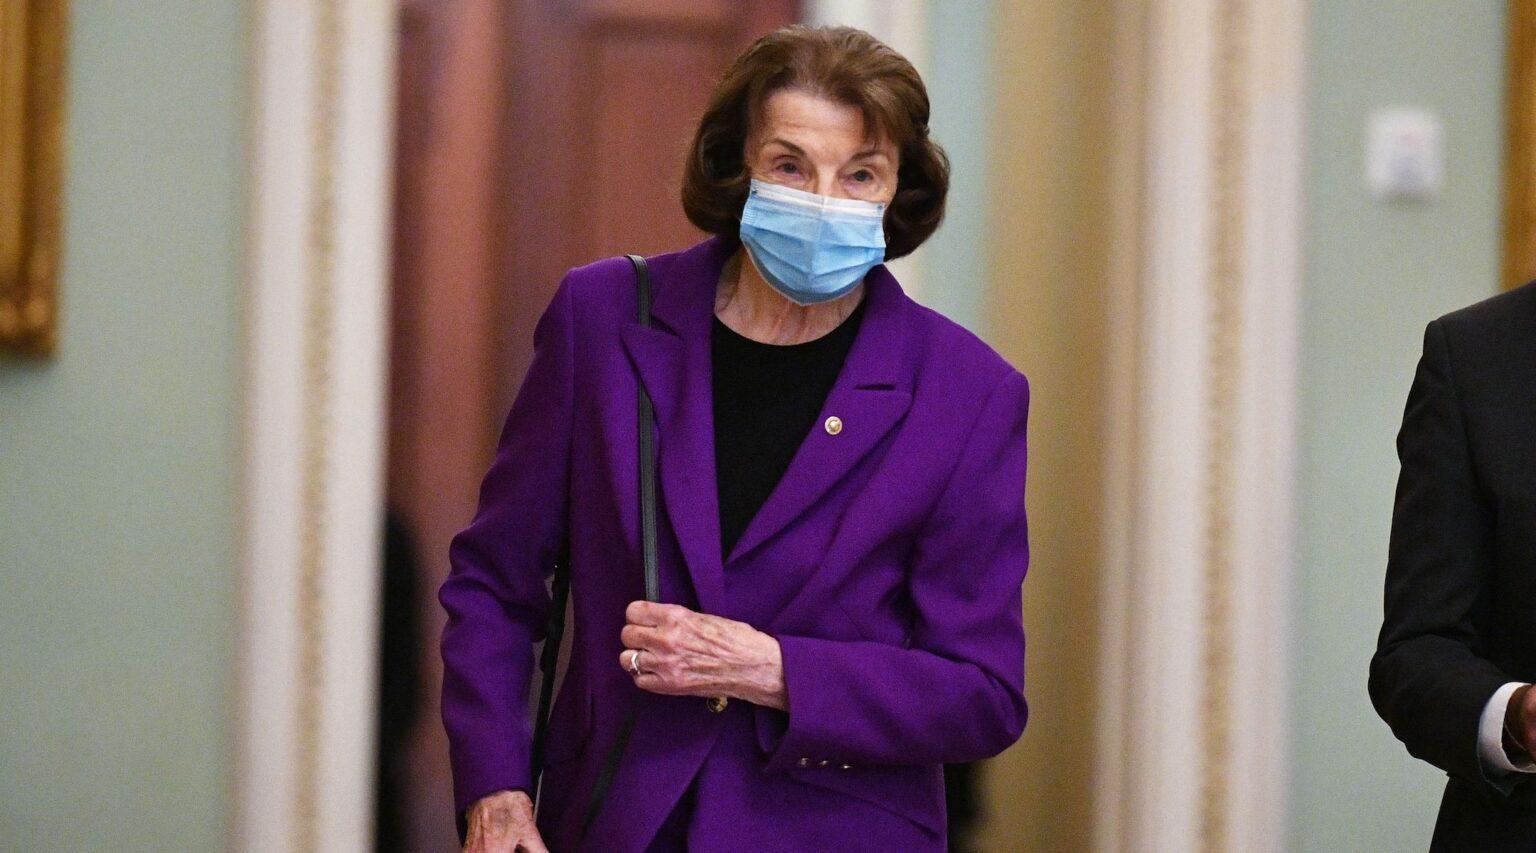 Sen. Dianne Feinstein makes her way to the Senate chamber, Aug. 10, 2021. (Photo/JTA-Mandel Ngan-AFP via Getty Images)